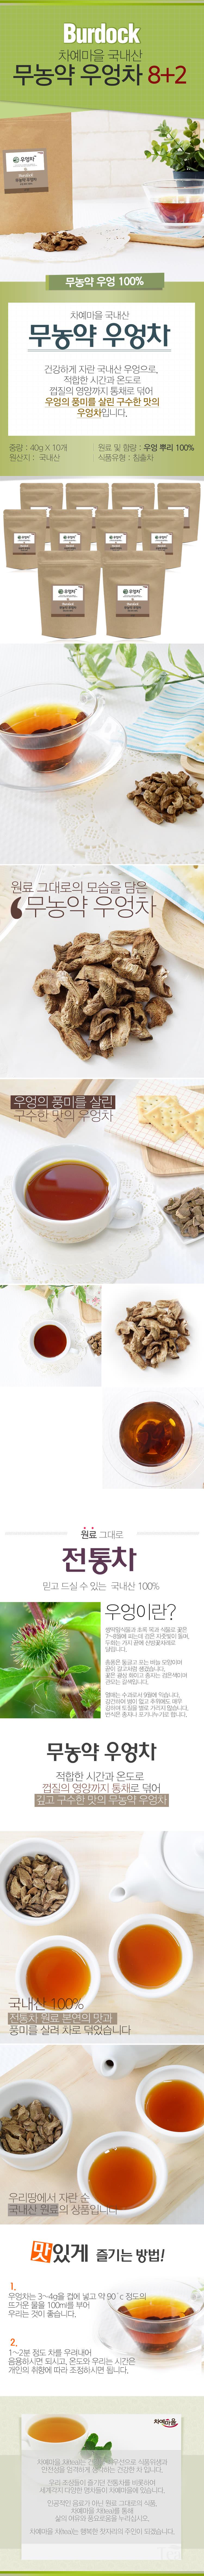 [ AndongMabuyongAriculture ] [ChayeTown]Korean Organic Burdock Tea 40g 8+2pcs